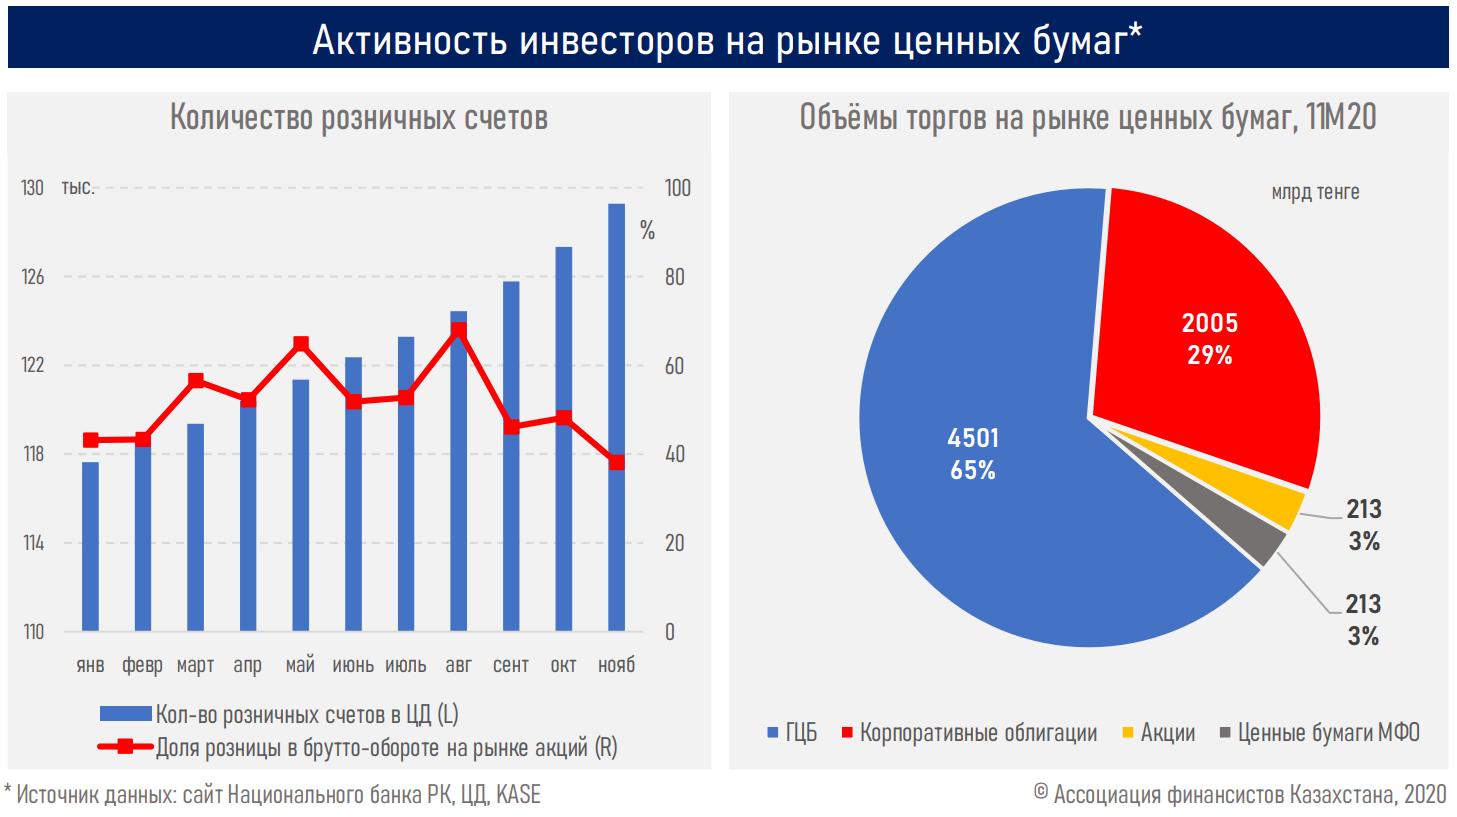 Индекс KASE достиг 13-летнего максимума - АФК 560478 - Kapital.kz